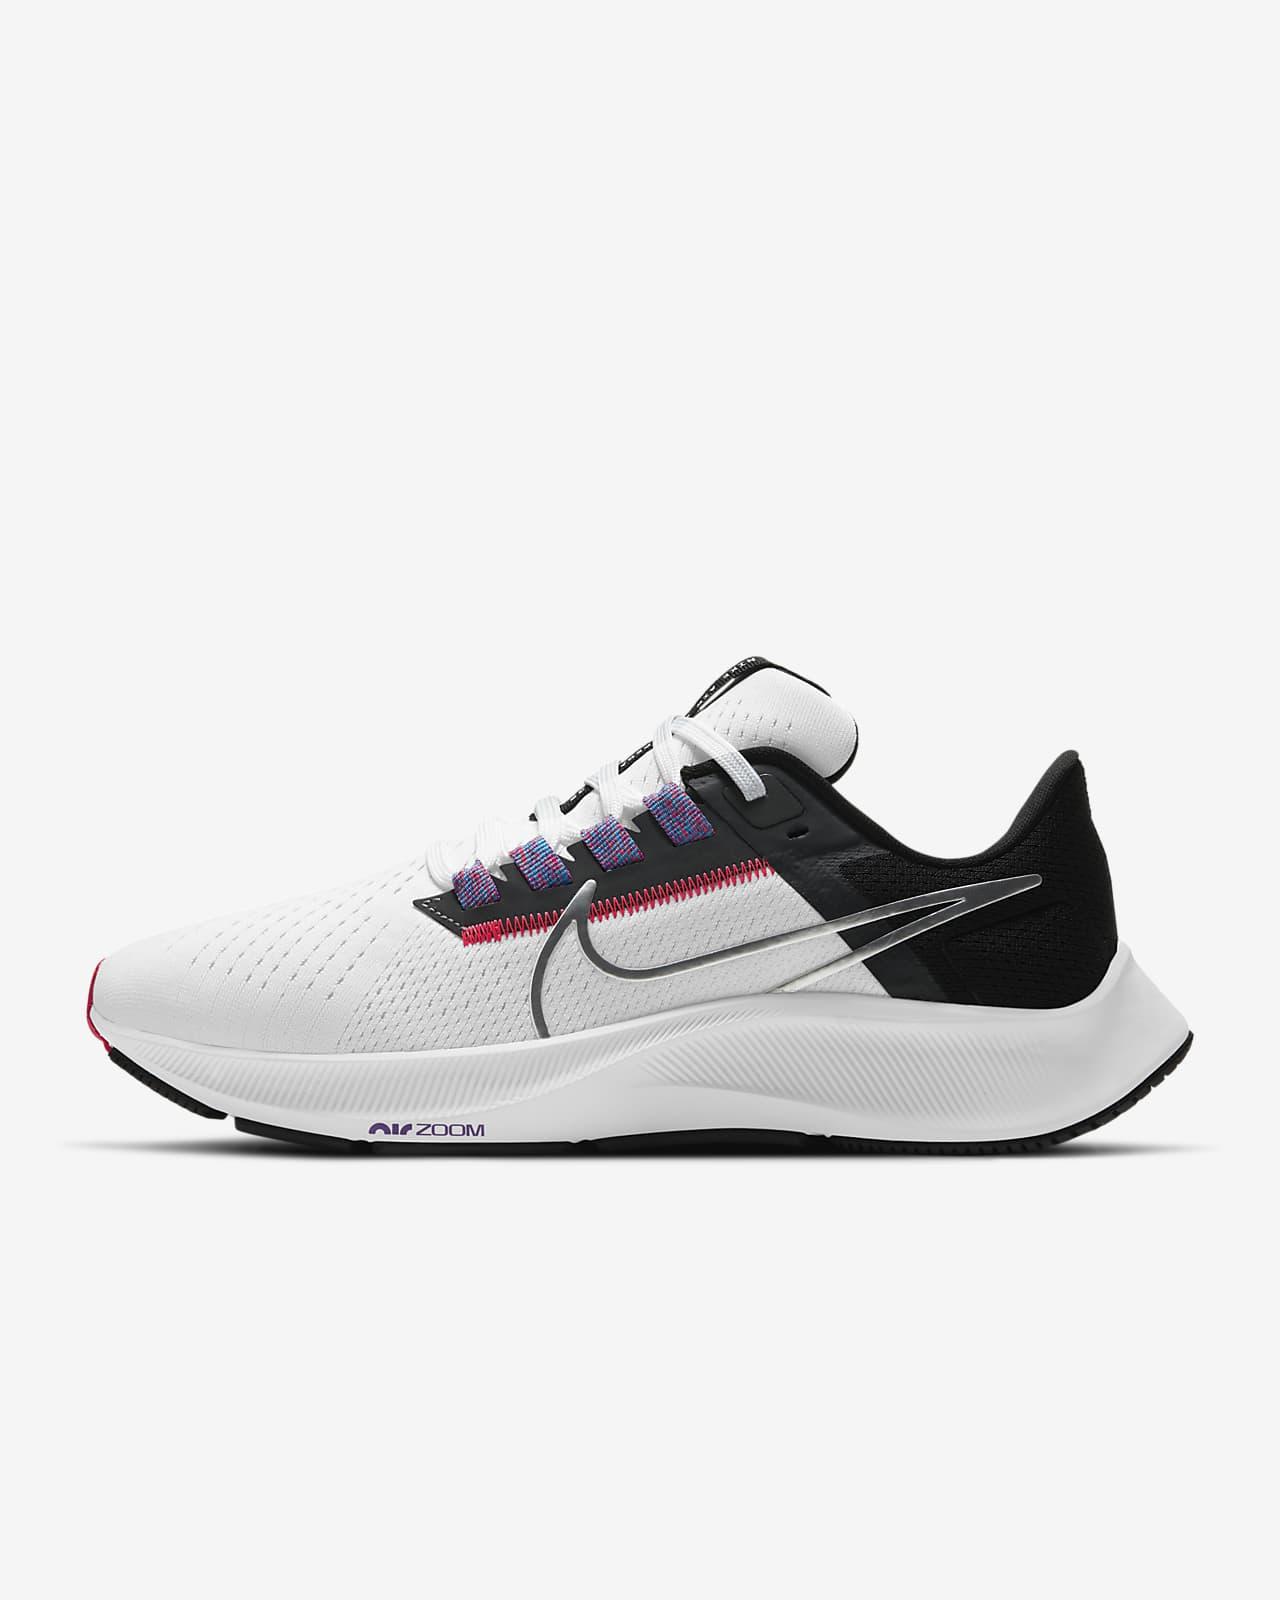 Löparsko Nike Air Zoom Pegasus 38 för kvinnor